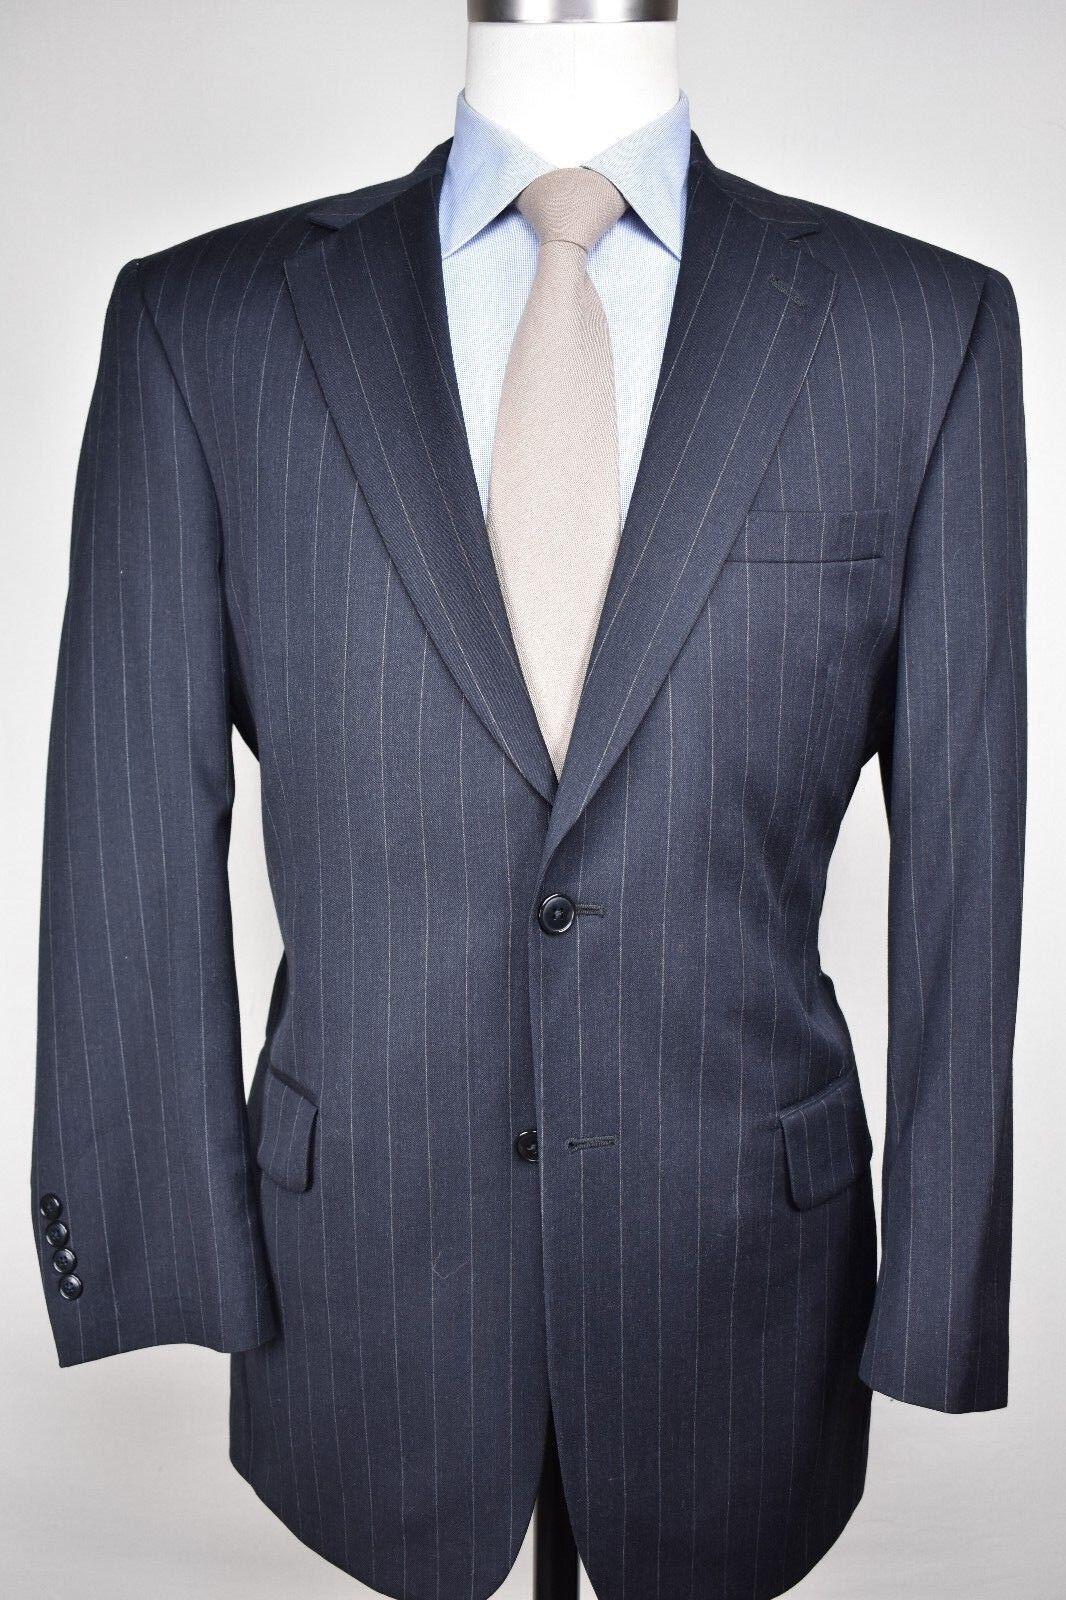 Jos. A. Bank Dark grau Pinstripe Worsted Wool Two Button Two Piece Suit Größe 41R